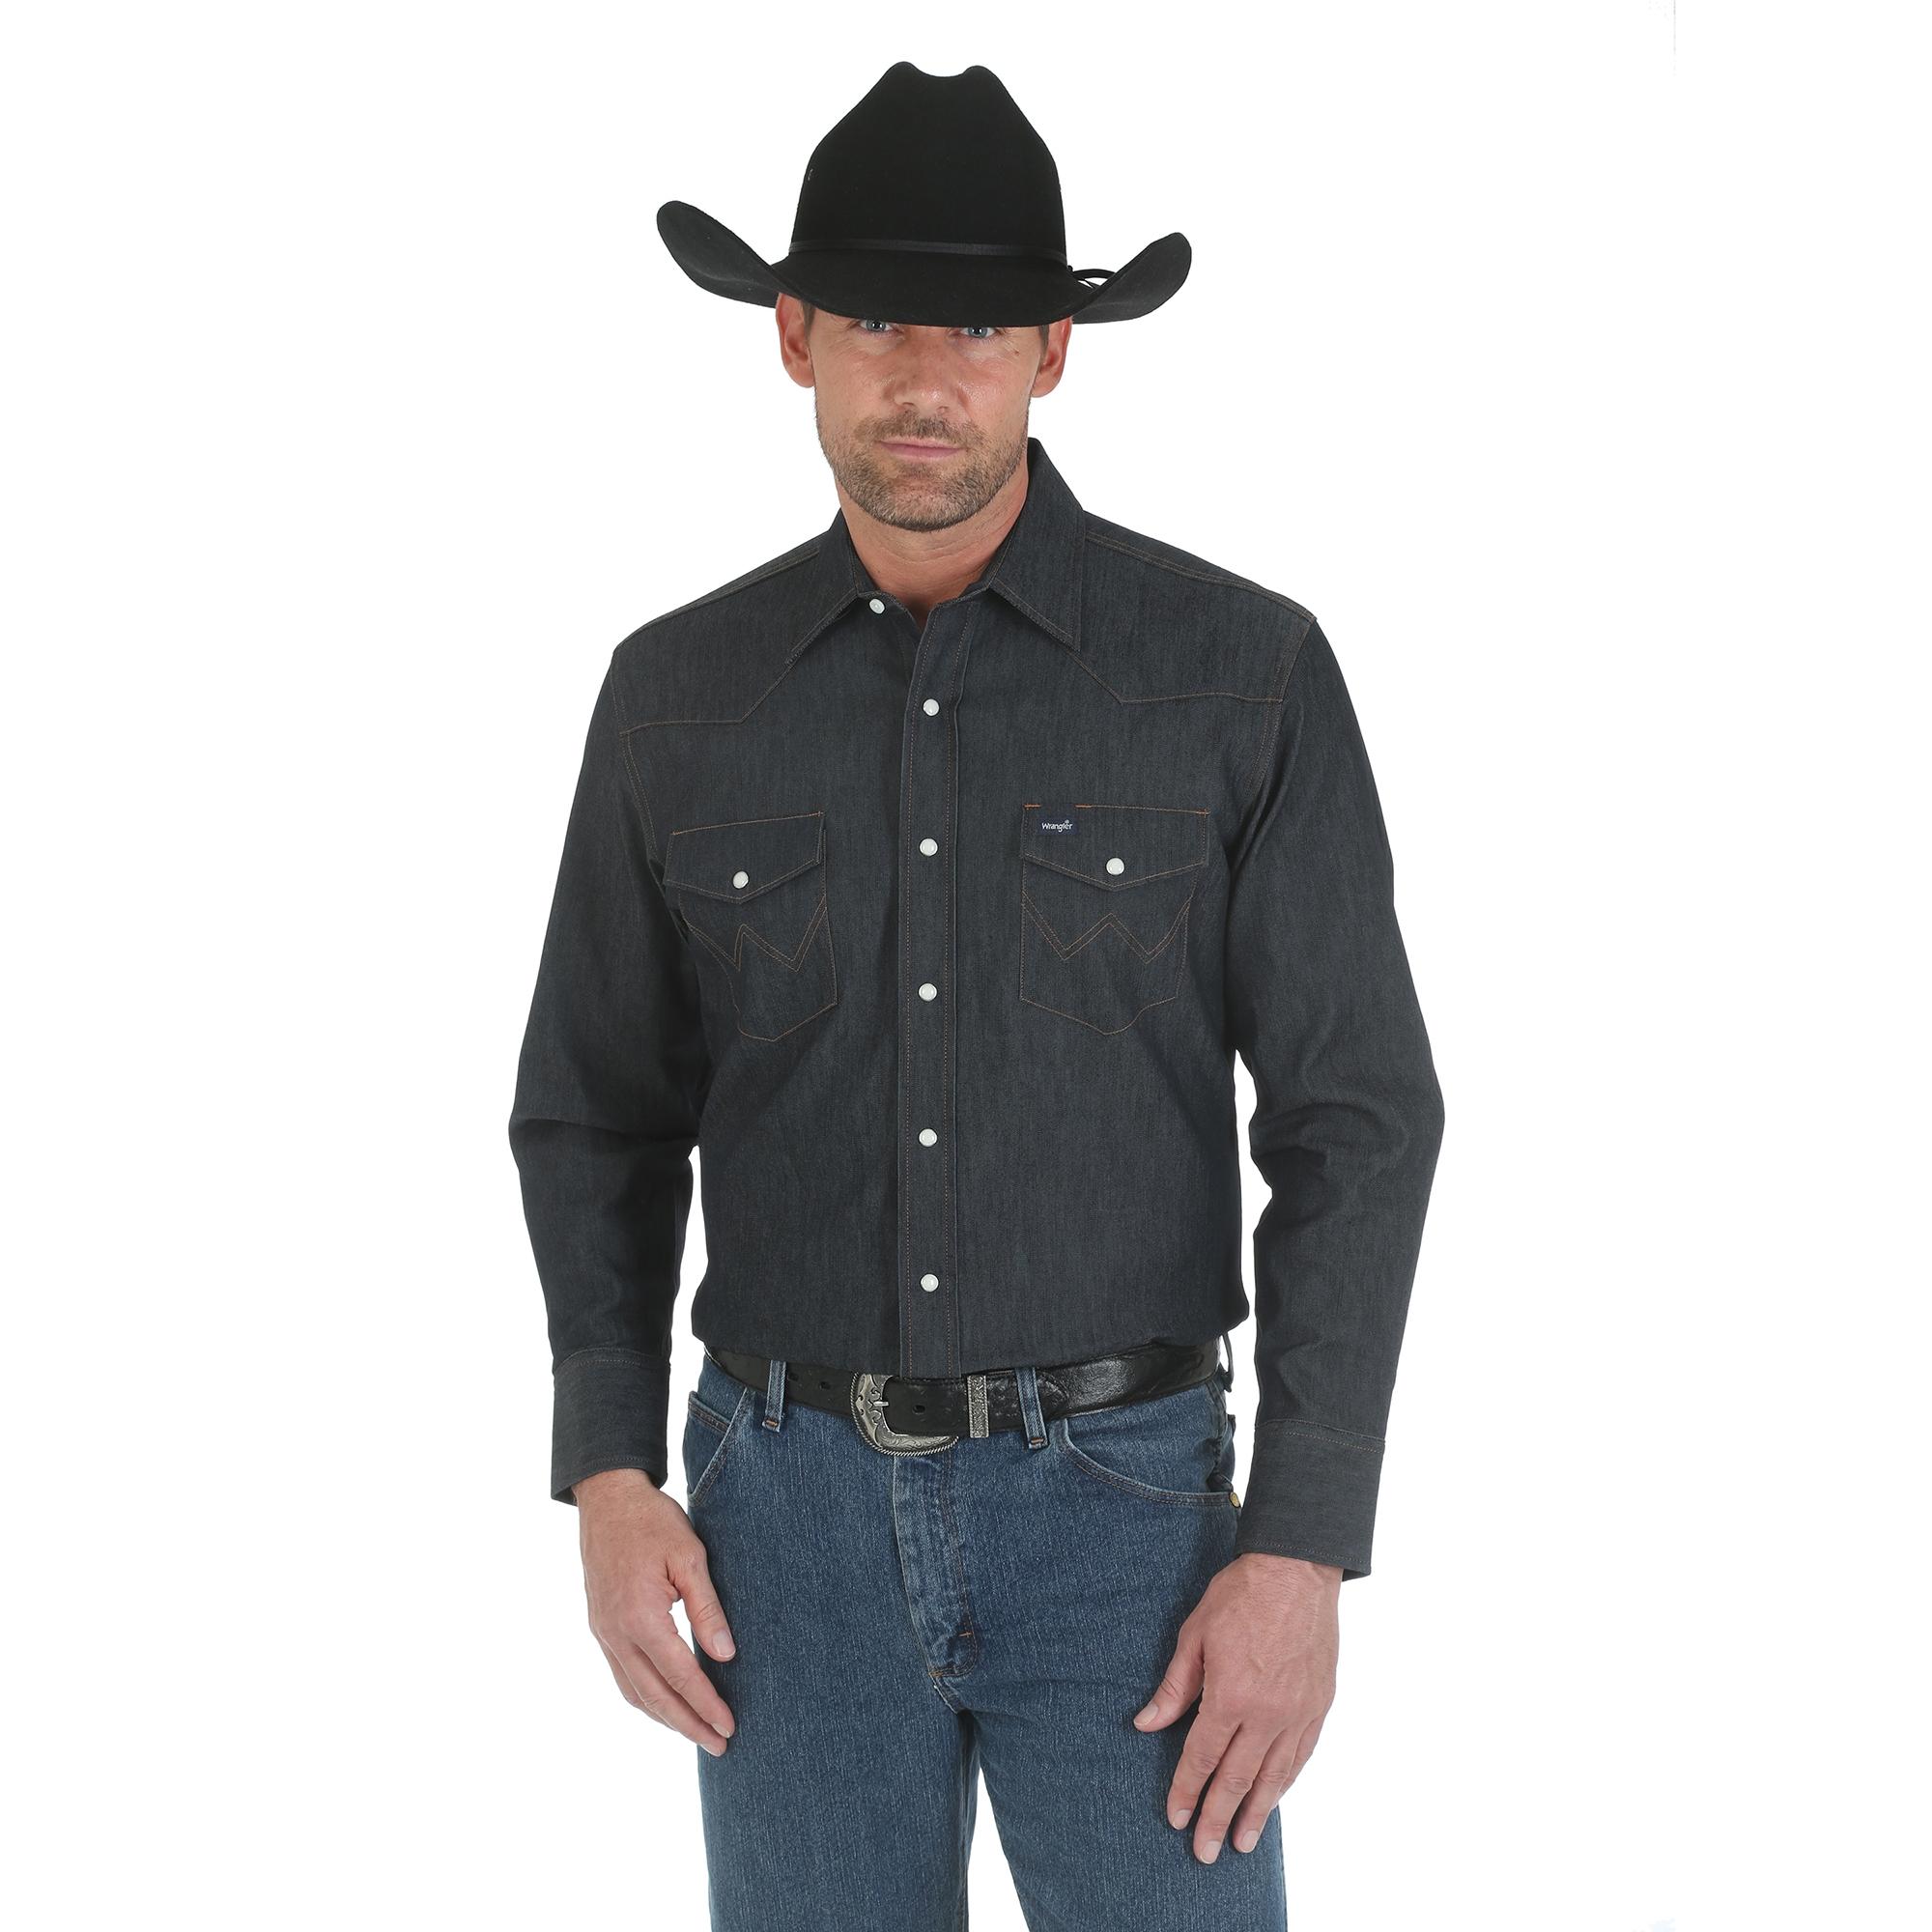 "MEN/'S WRANGLER COWBOY CUT WESTERN SNAP SHIRT NEW IN PACKAGING  20x35/"" WHITE"